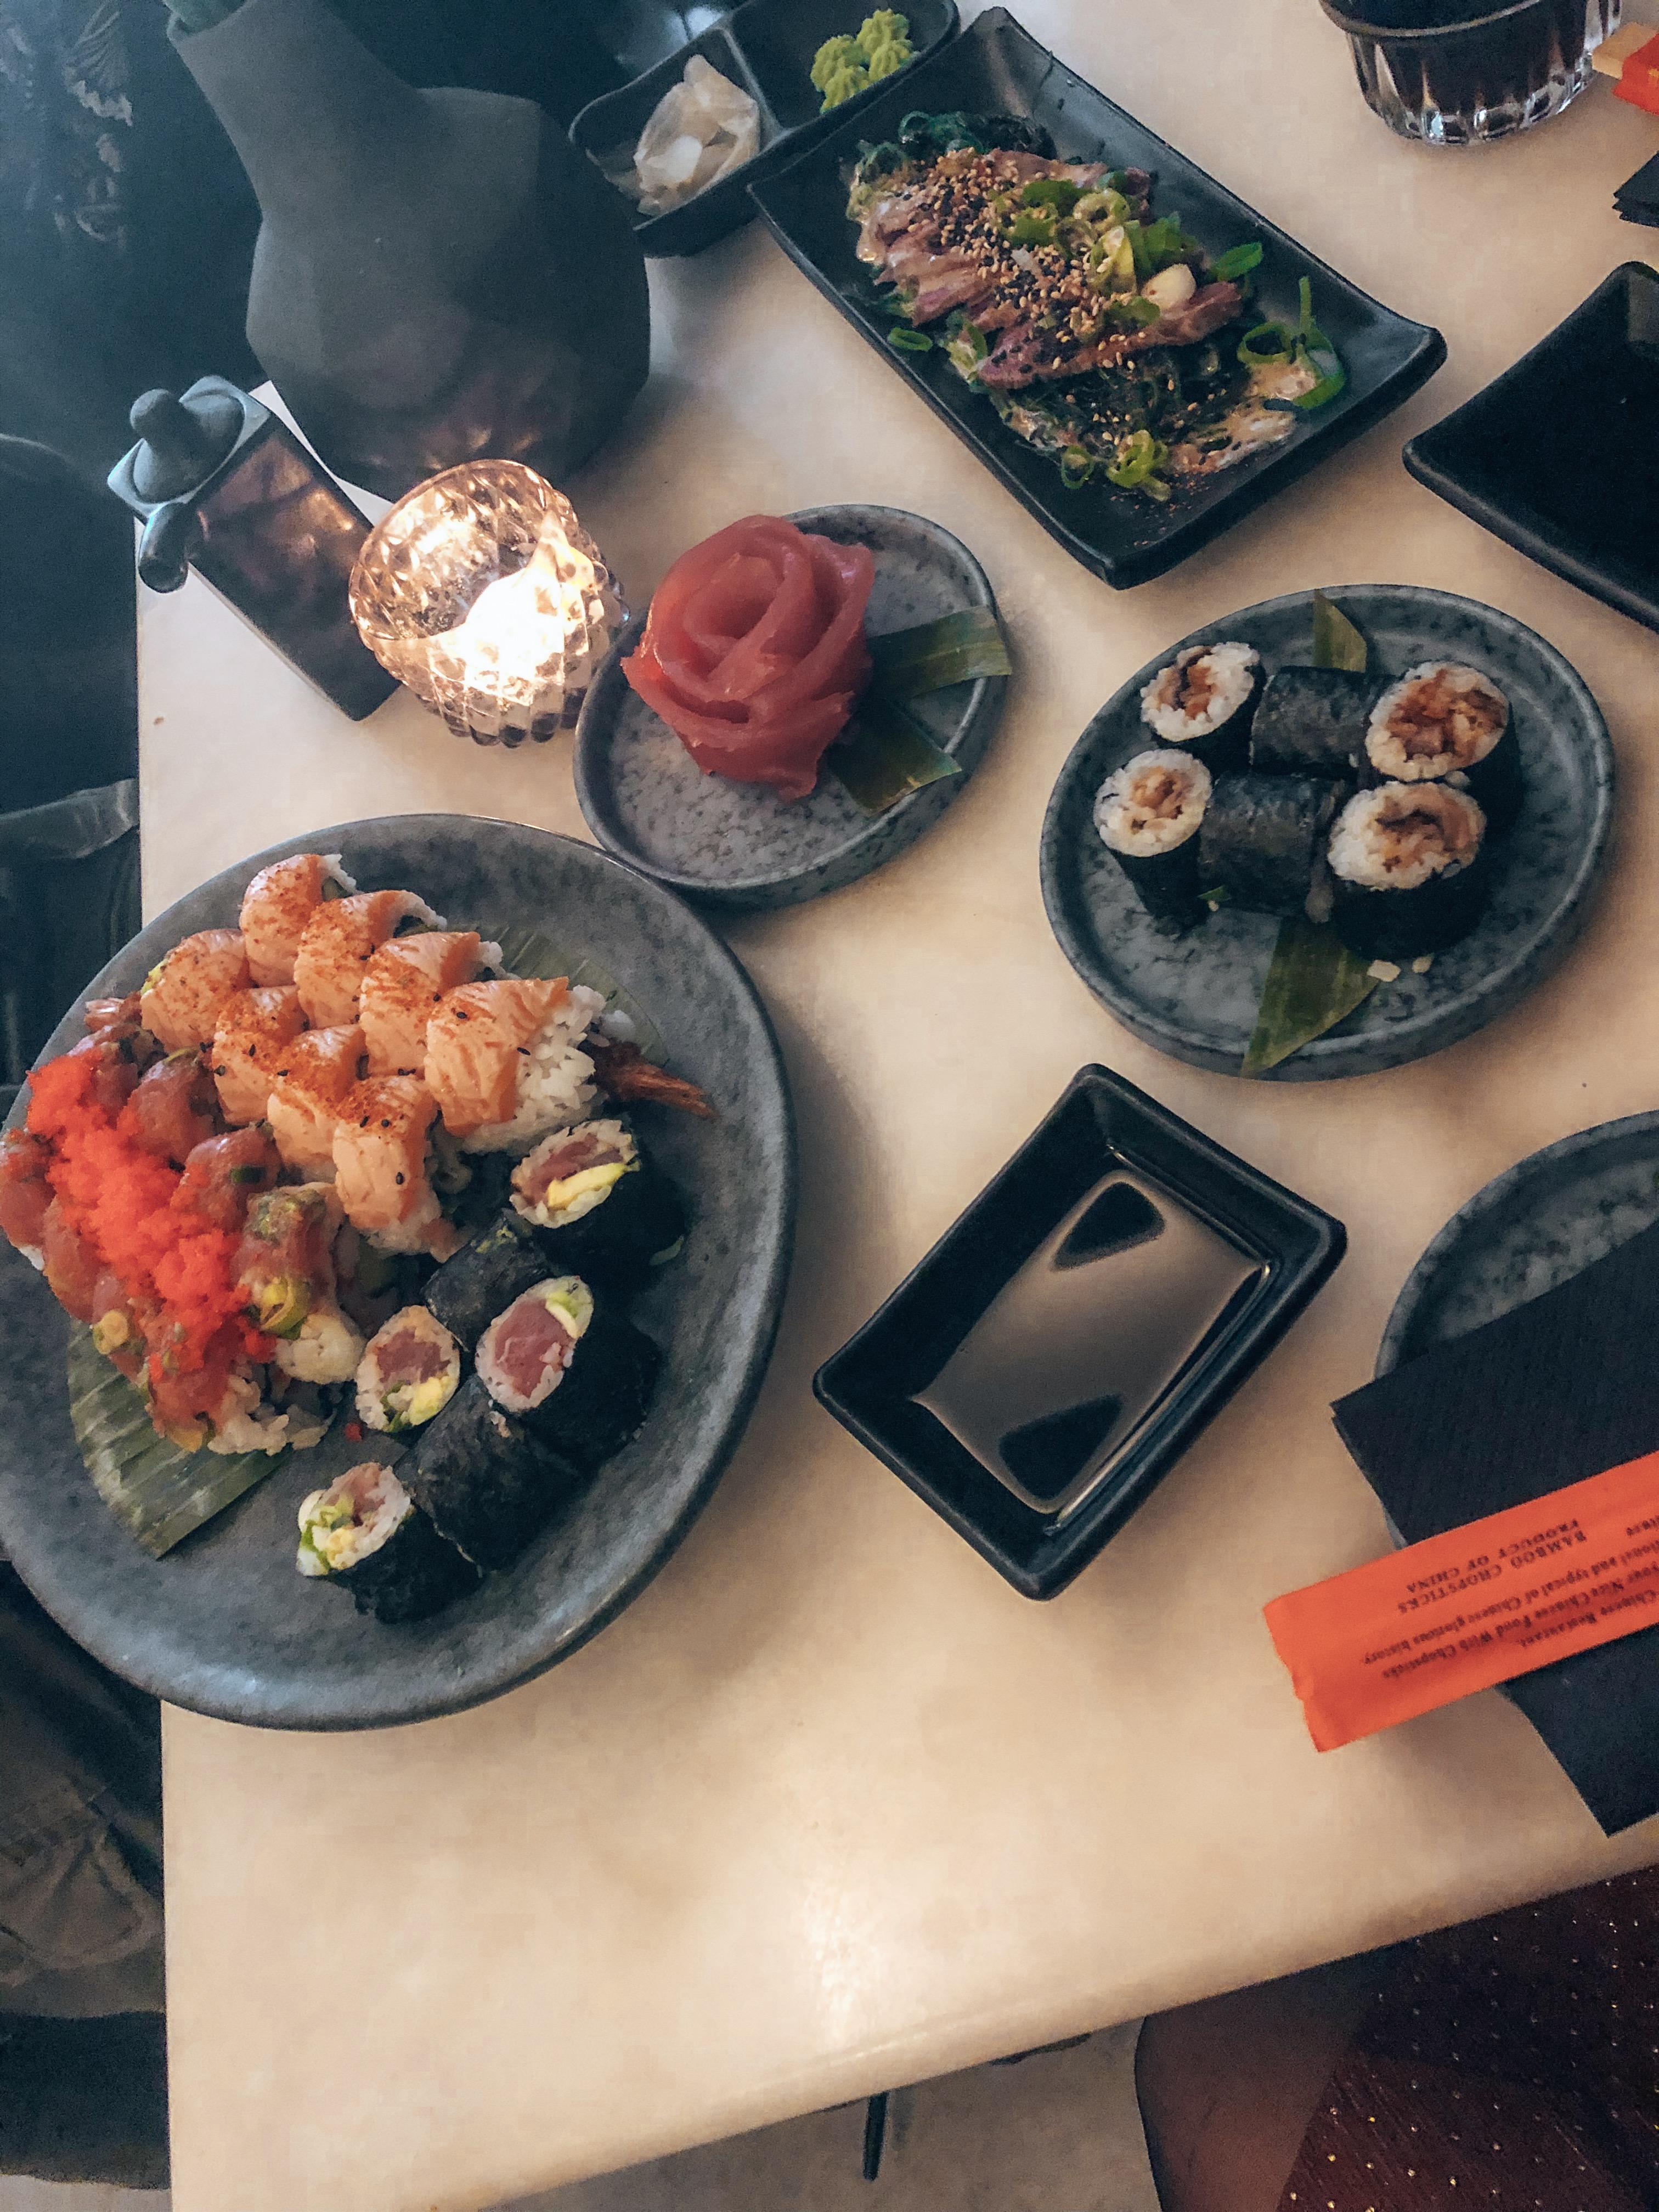 Den Haag, corona, hotel, weekend weg, weekendje weg, weekend, weekendje, binnenhof, oker, sushi, restaurant, hotspot